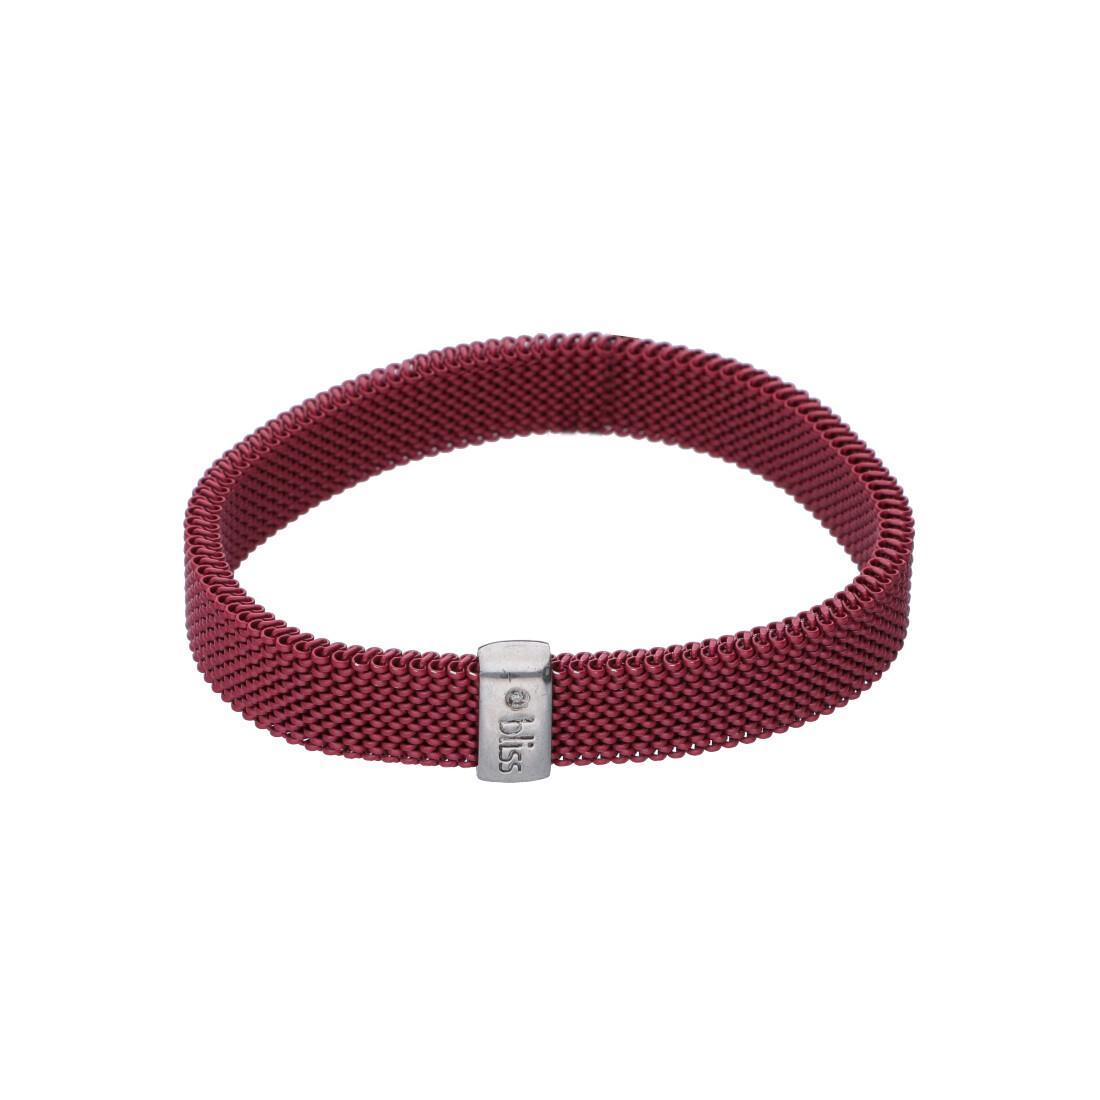 Bracciale elastico in acciaio rosso con targa argento - BLISS